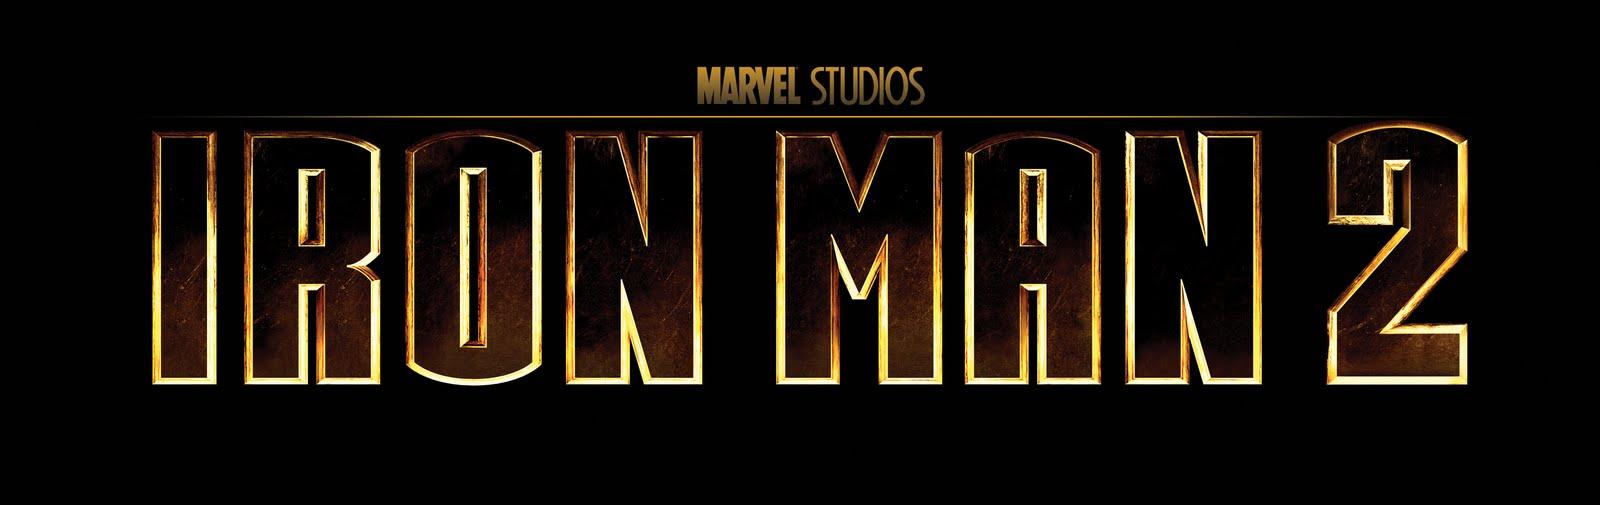 first marvel intro logo iron man 2008 - 1097×604